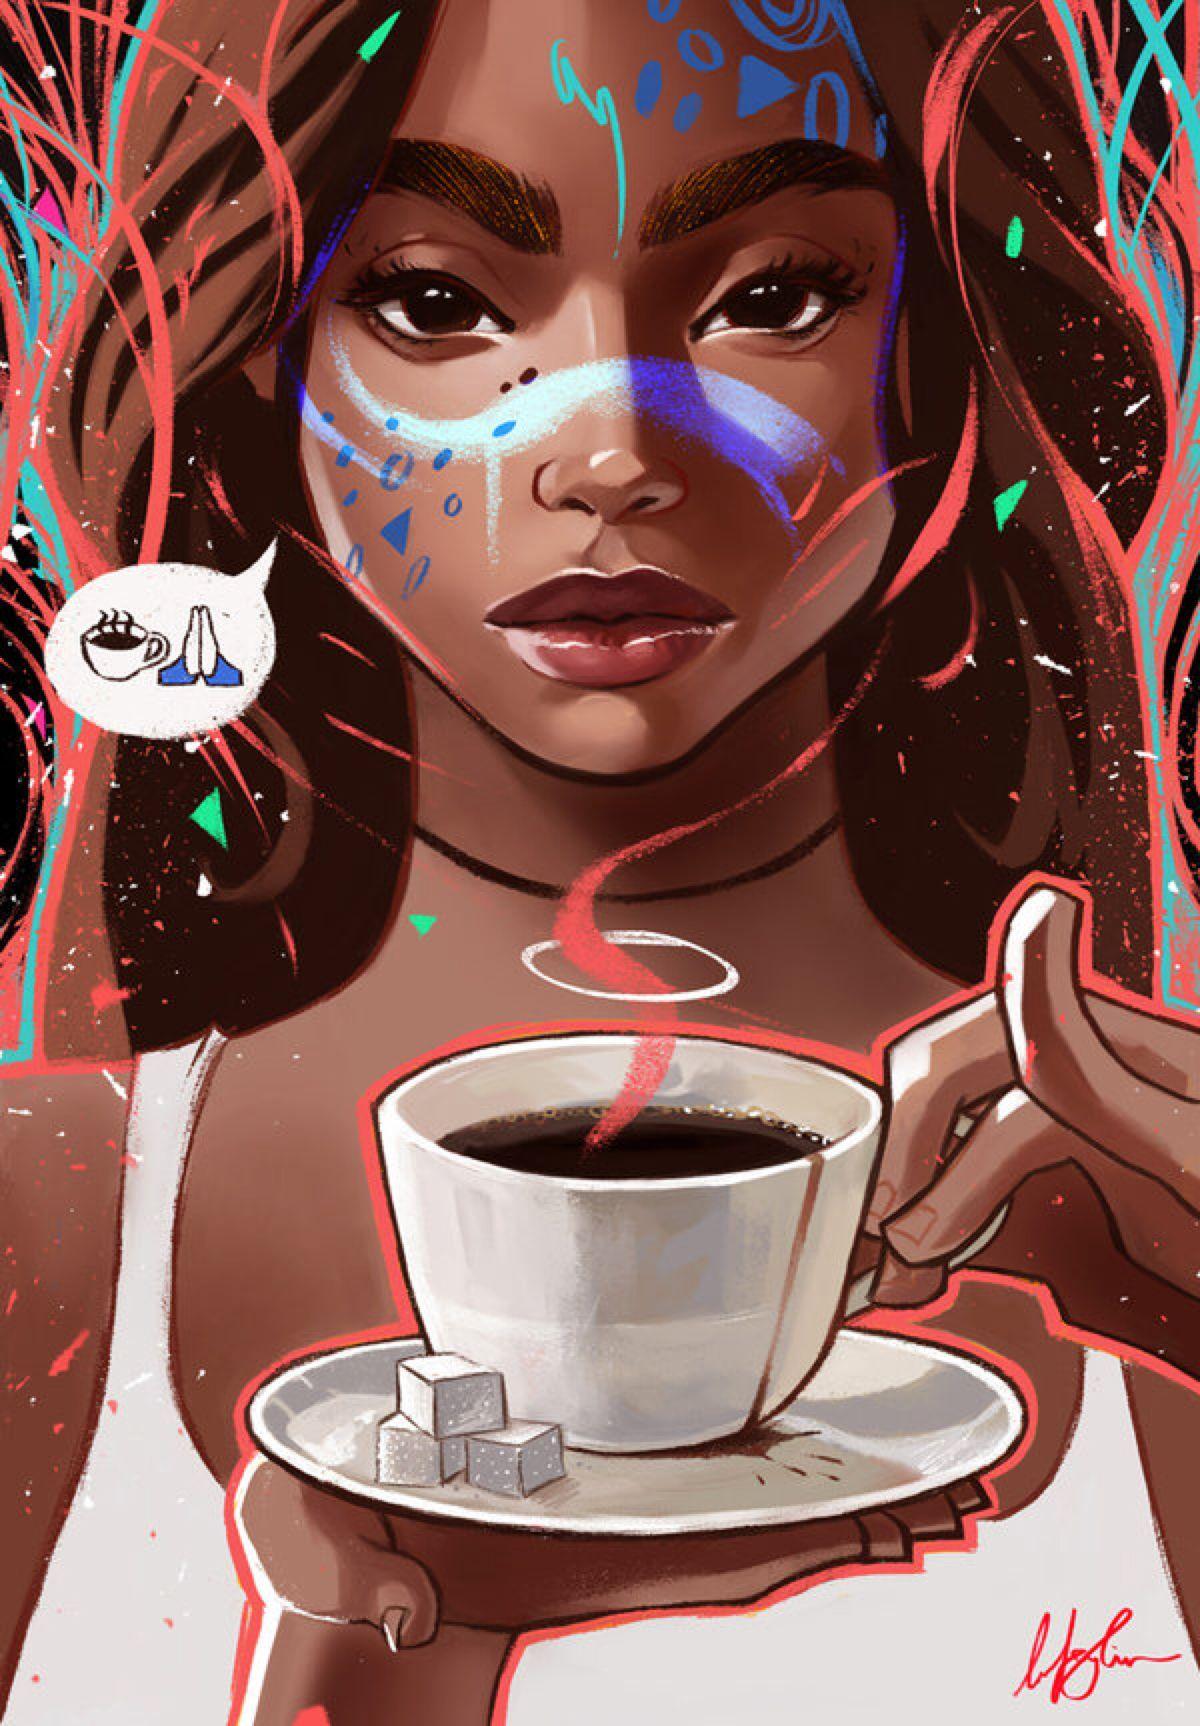 Morning prayer & coffee ☕️ 2018 styles Follow Chanel